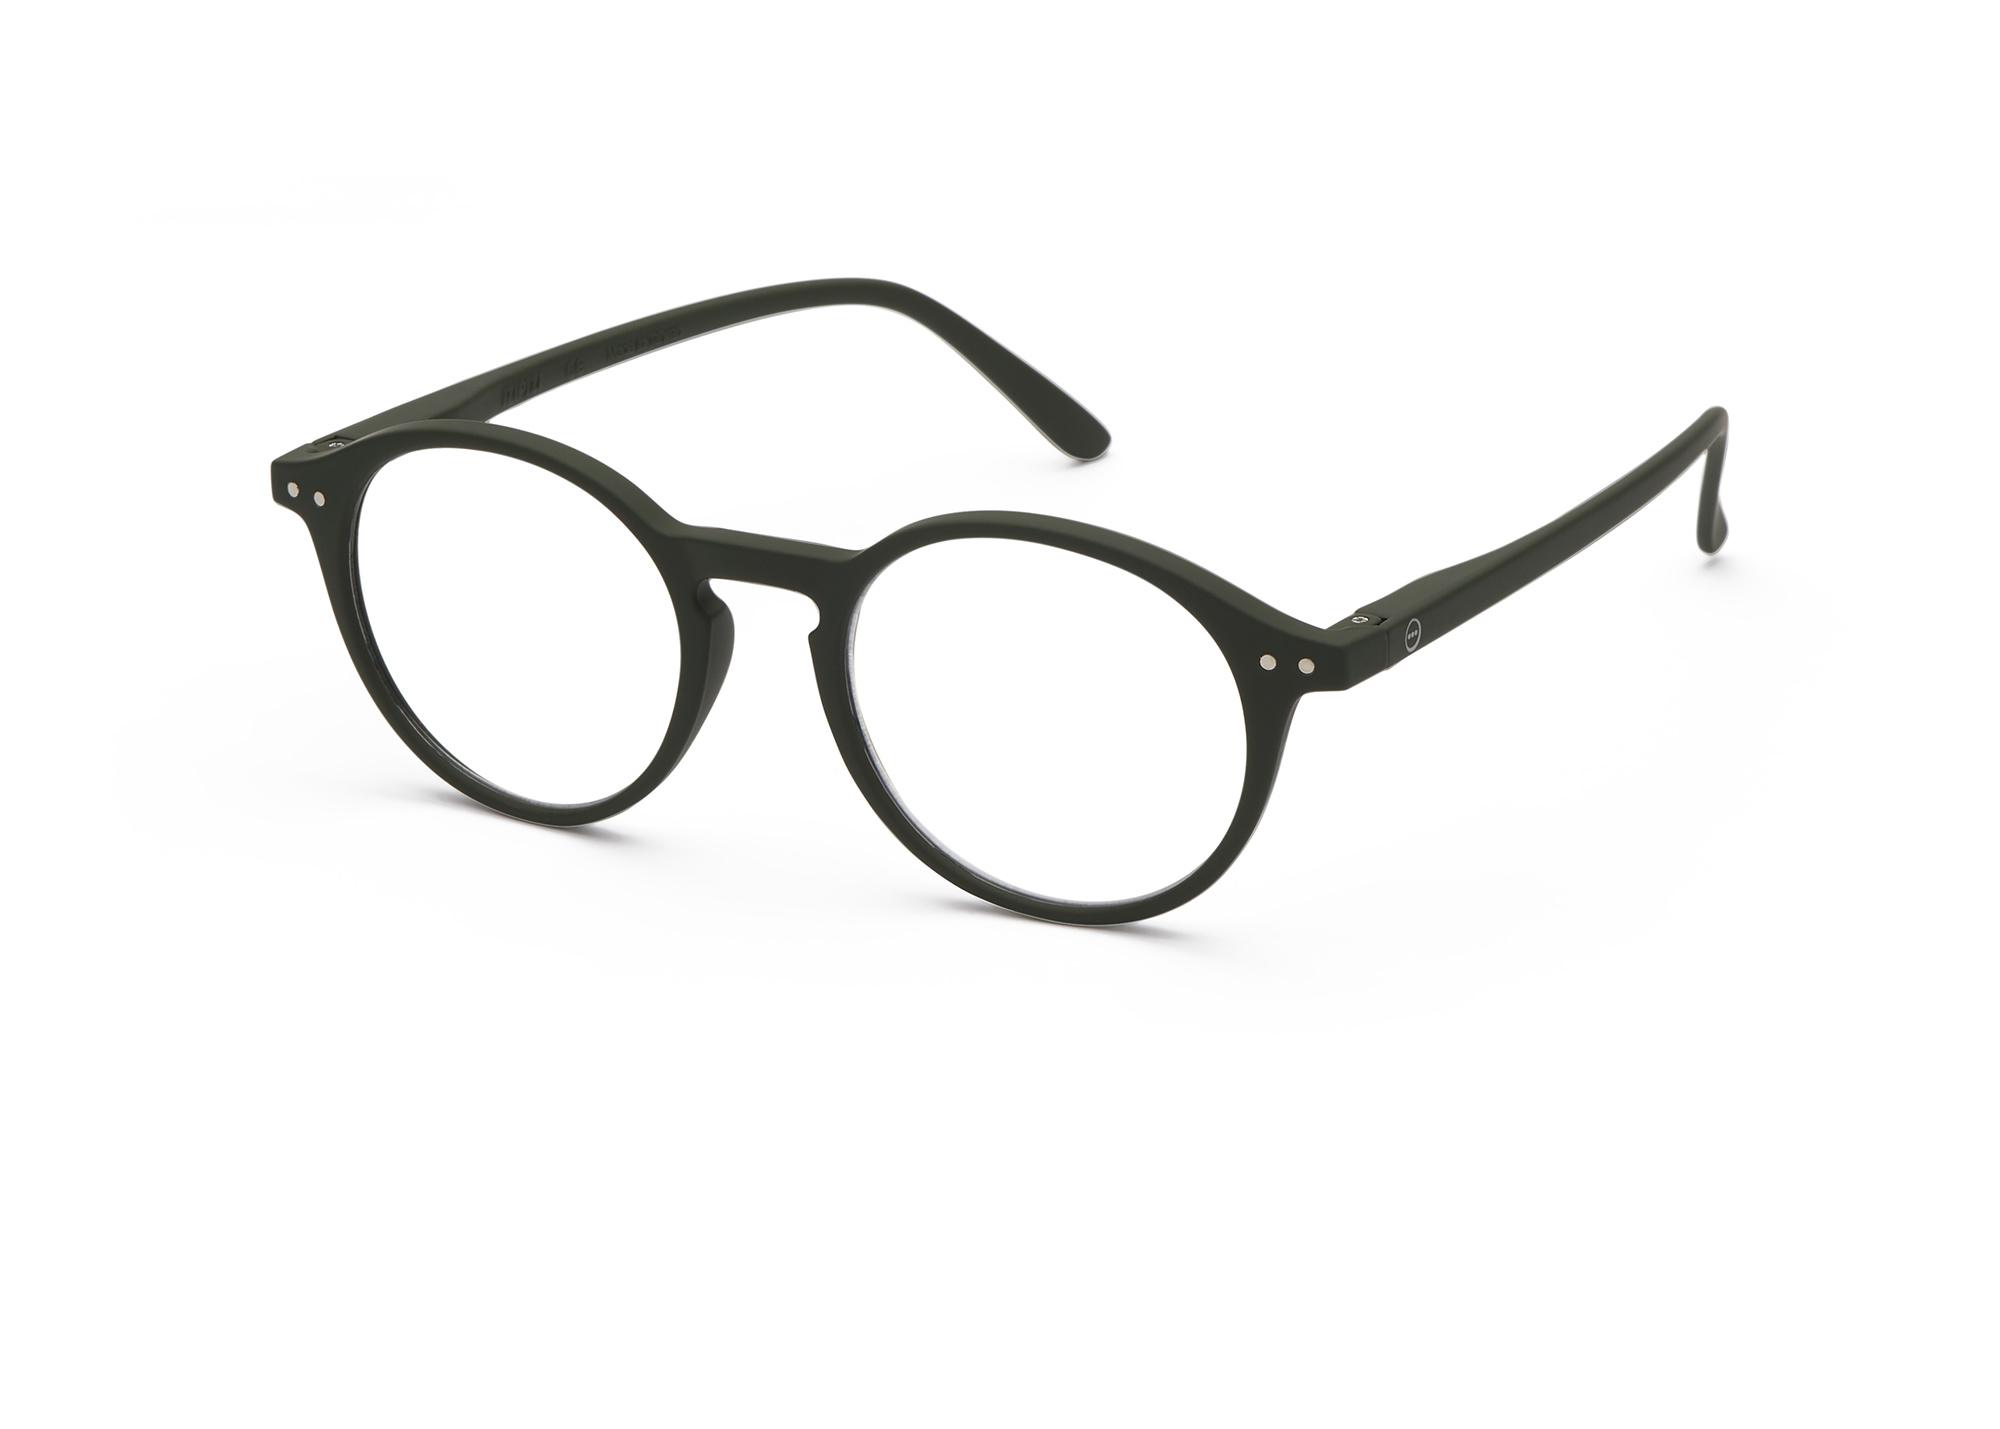 Izipizi leesbril model D Kaki Green-3